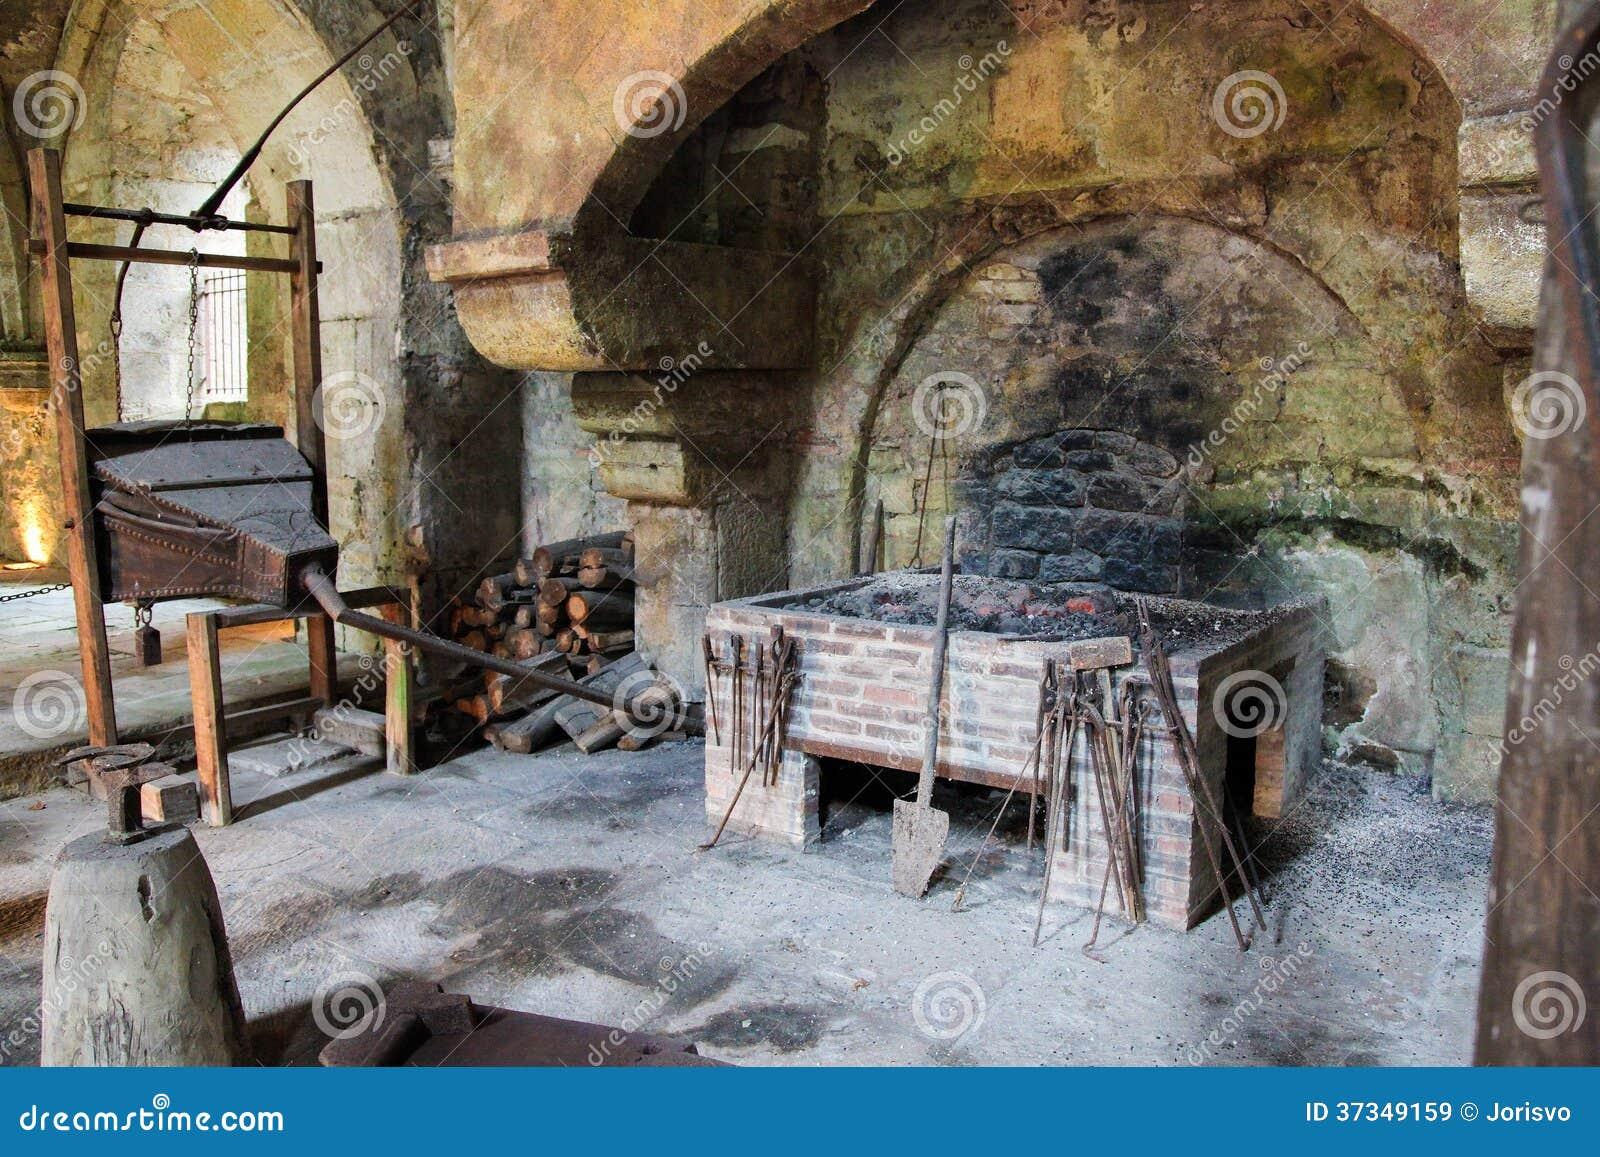 vieille chemin e image stock image du panier france. Black Bedroom Furniture Sets. Home Design Ideas